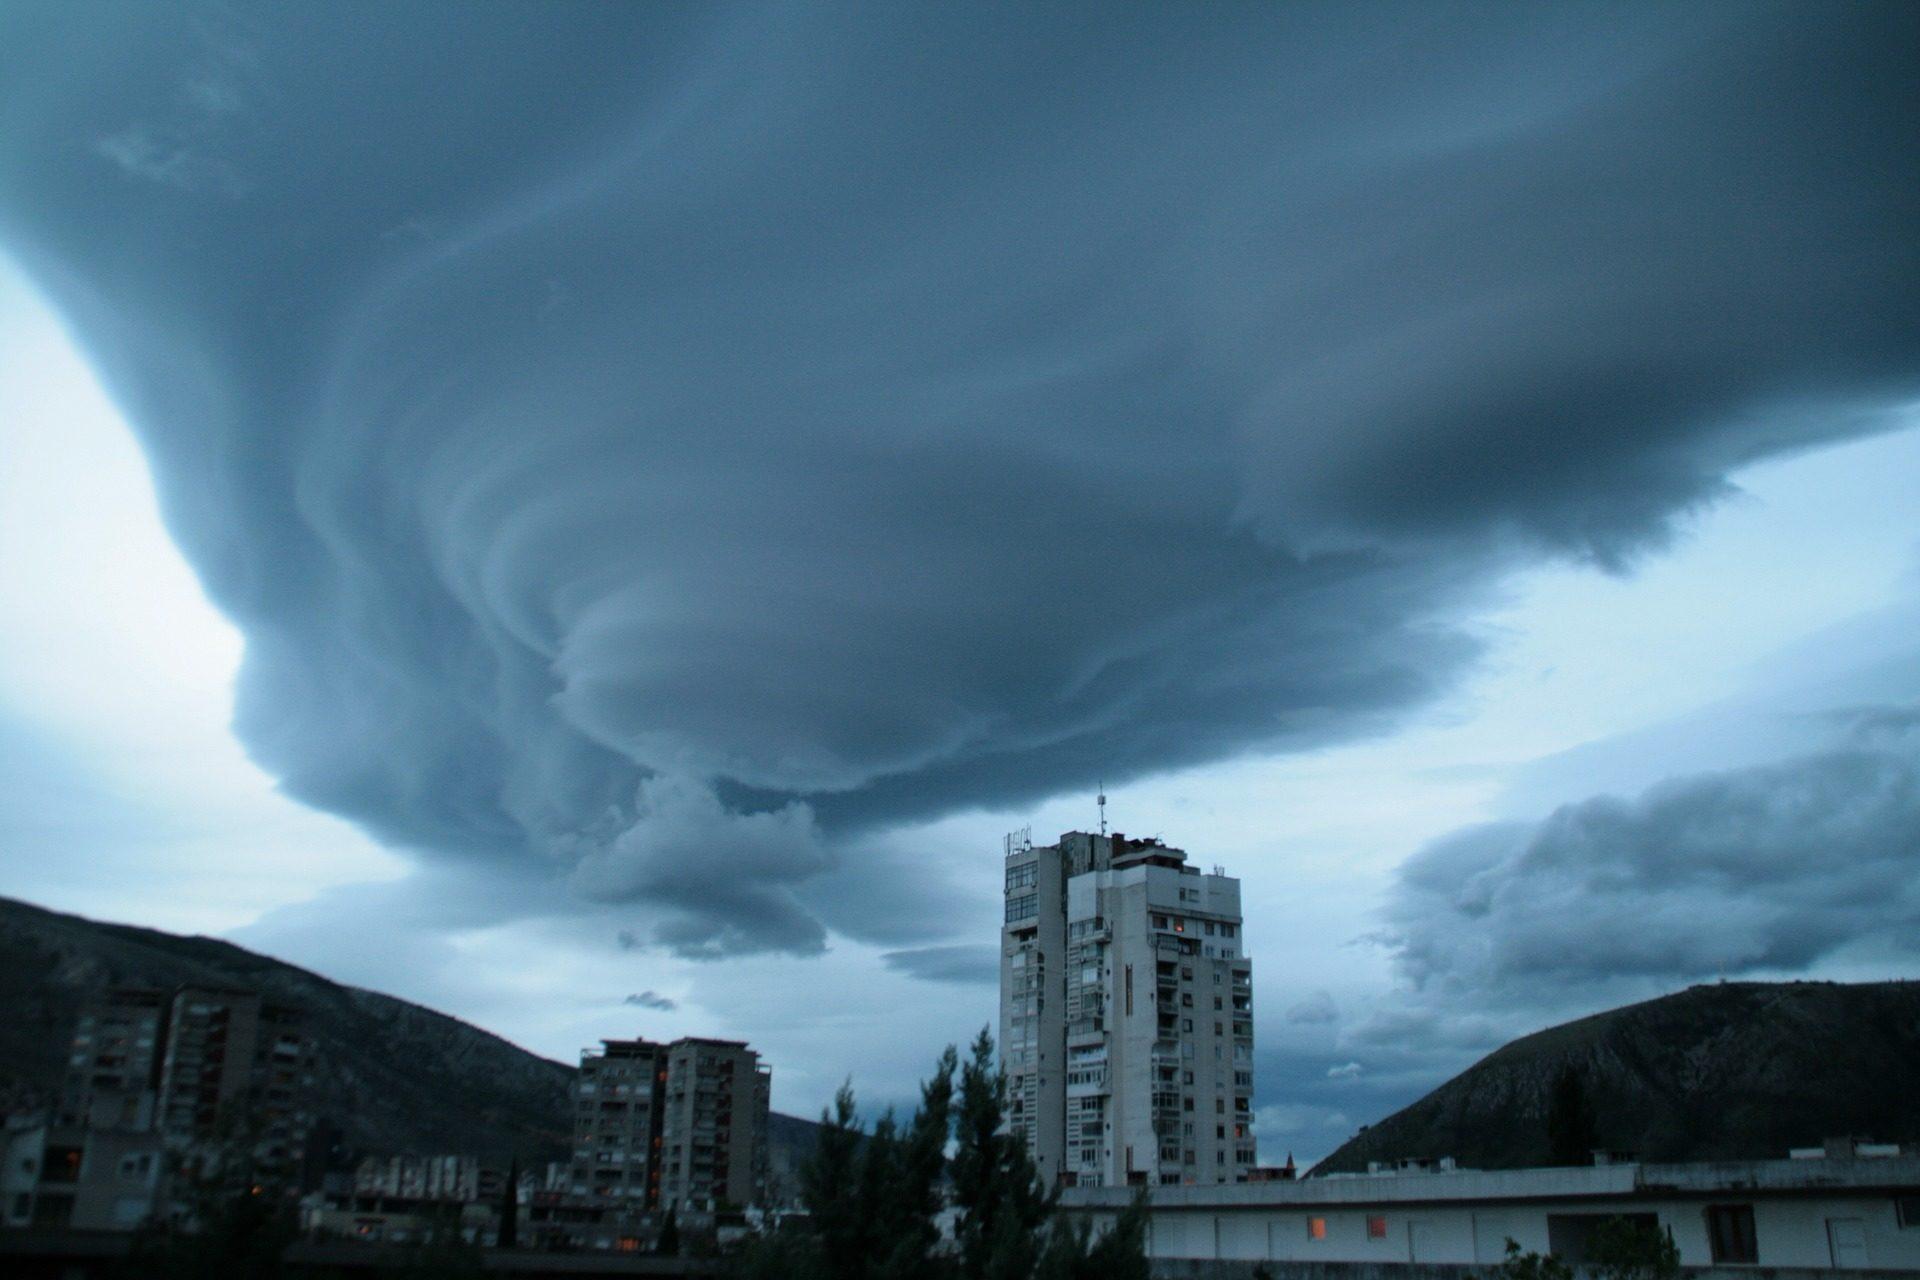 शहर, बिल्डिंग, तूफान, बादल, भंवर, खतरे, एड़ी - HD वॉलपेपर - प्रोफेसर-falken.com